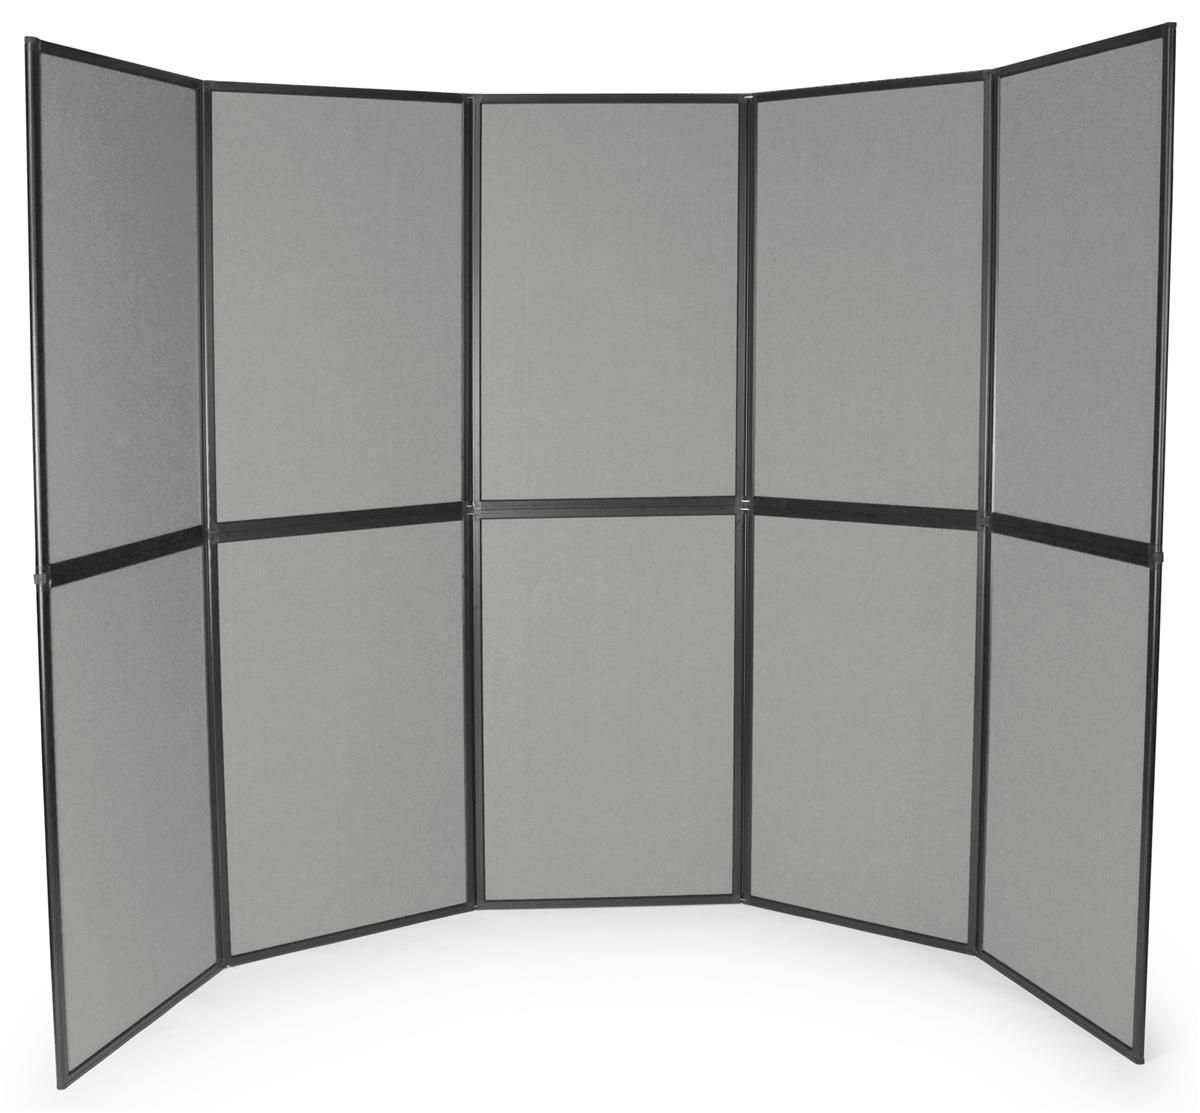 Large Grey Folding Display Boards System